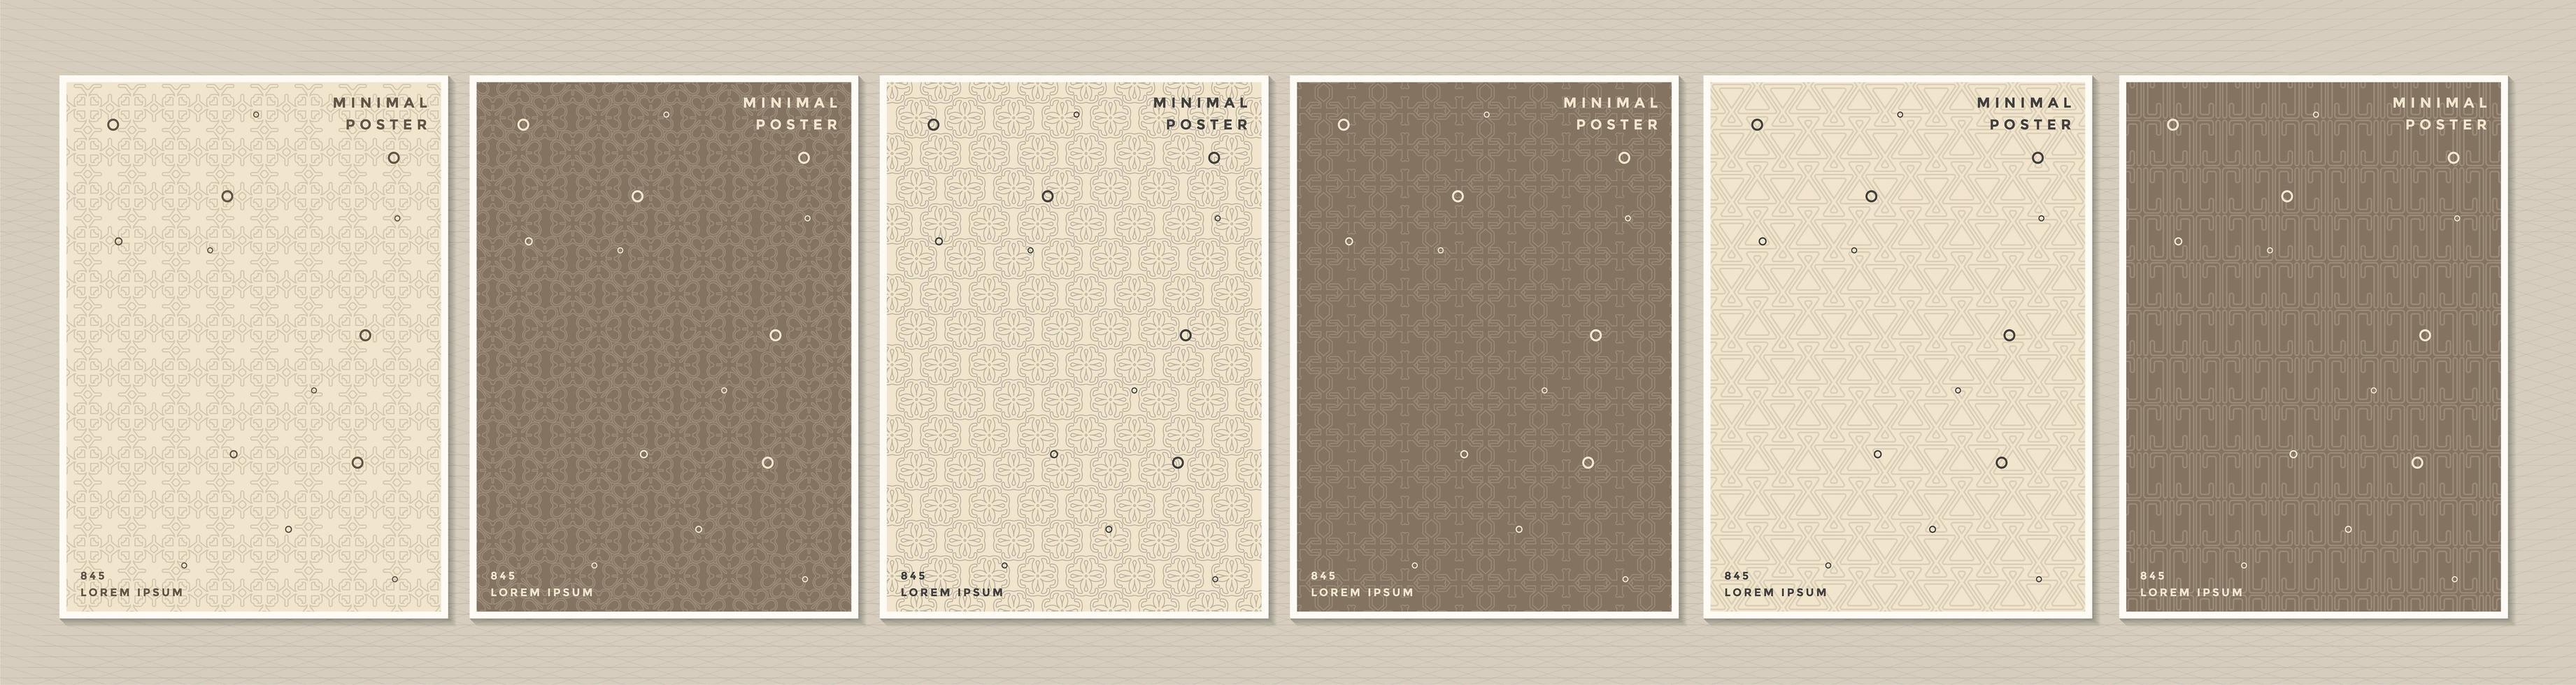 bruin en crème patroon cover of poster set vector